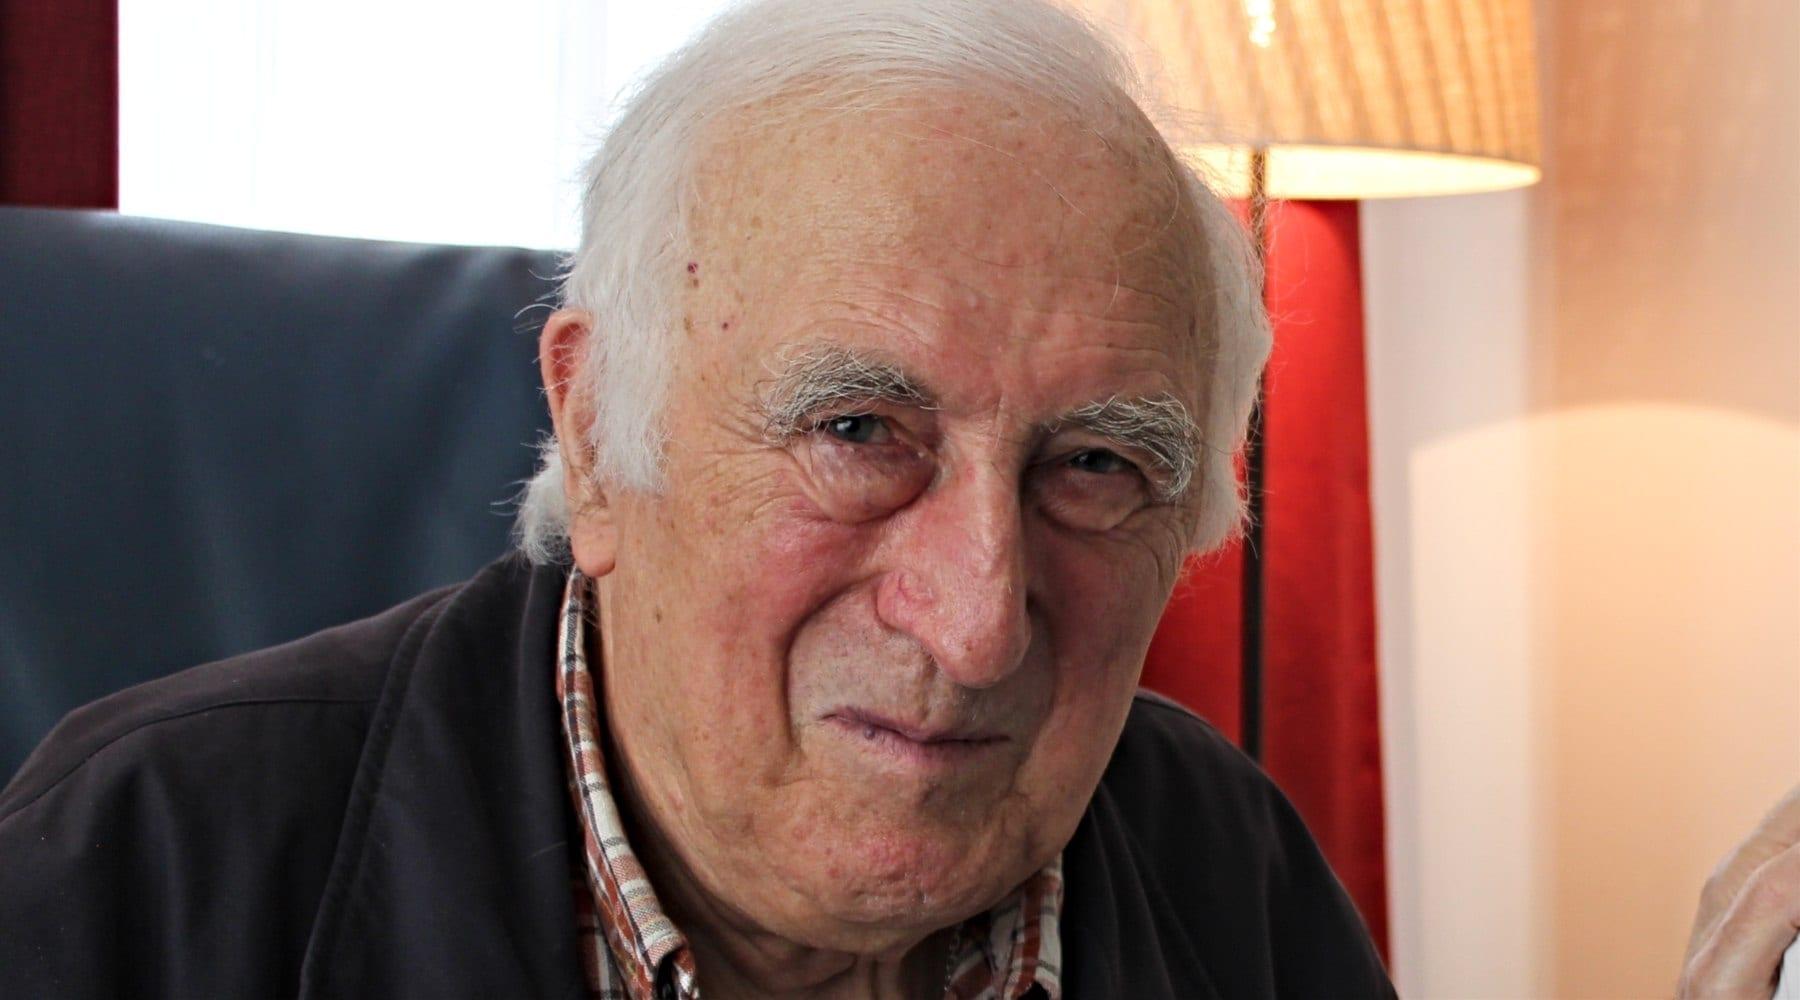 Jean Vanier, founder of L'Arche